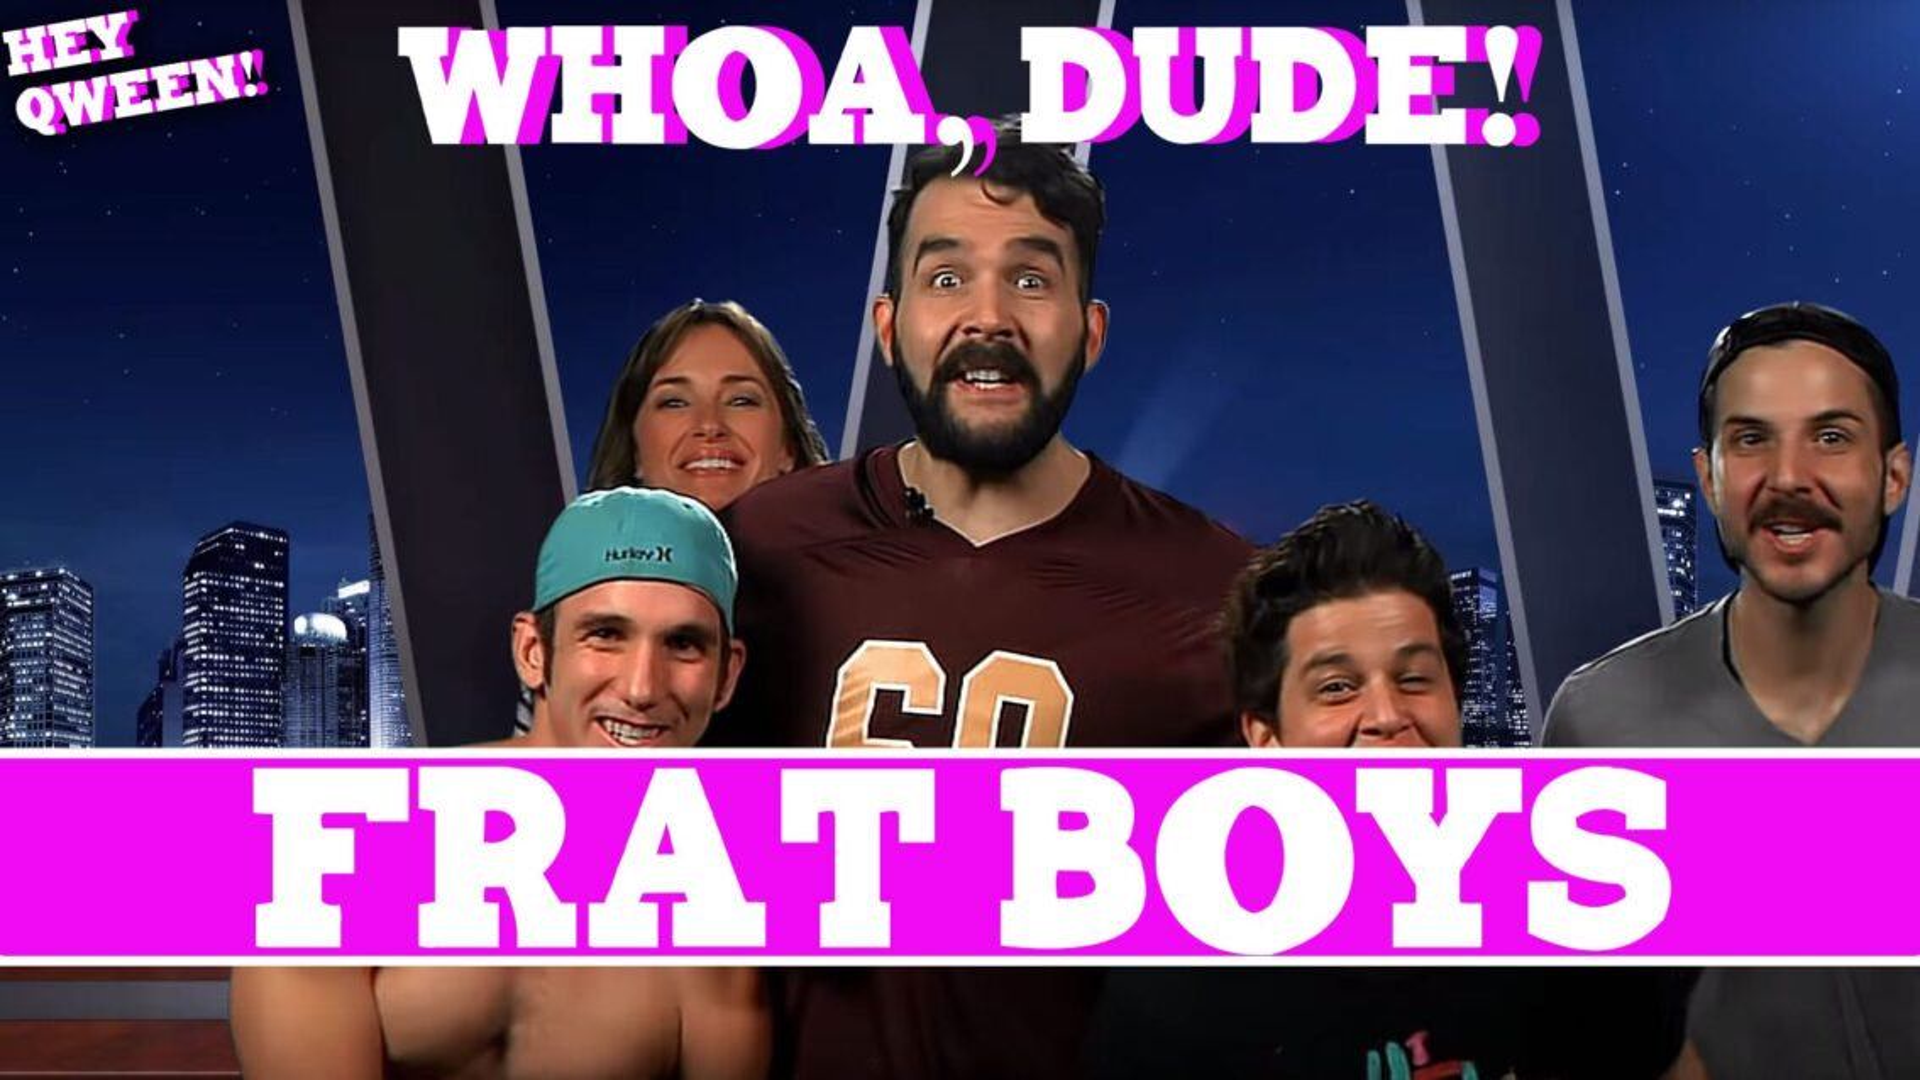 Whoa, Dude! Frat Boys, Episode 102